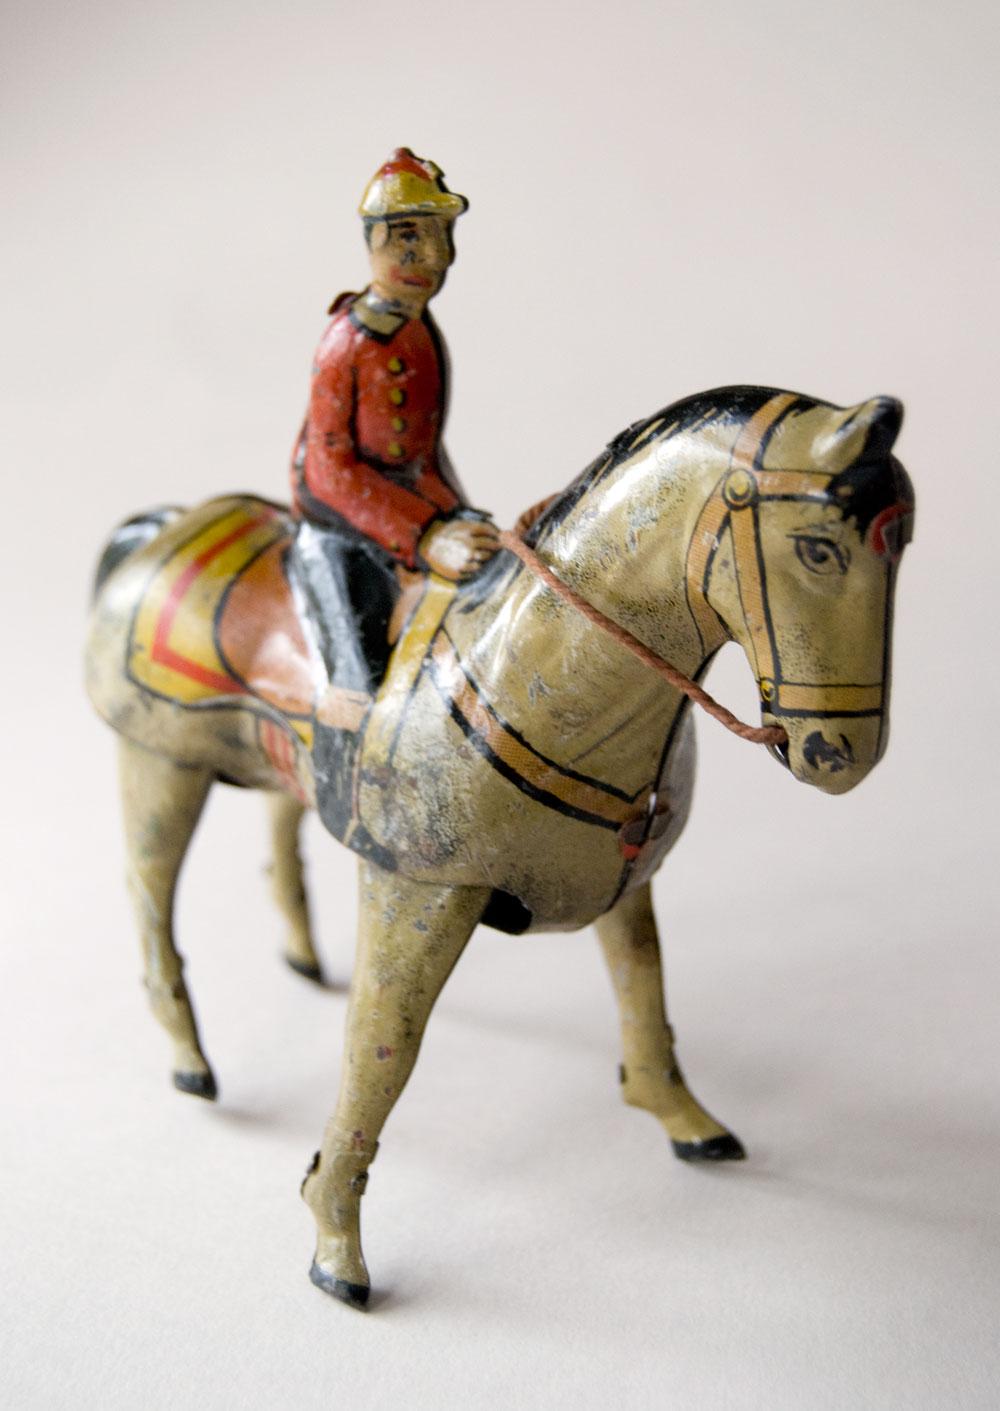 20th Century Toys : Antique tin litho wind up jockey on horse toy germany